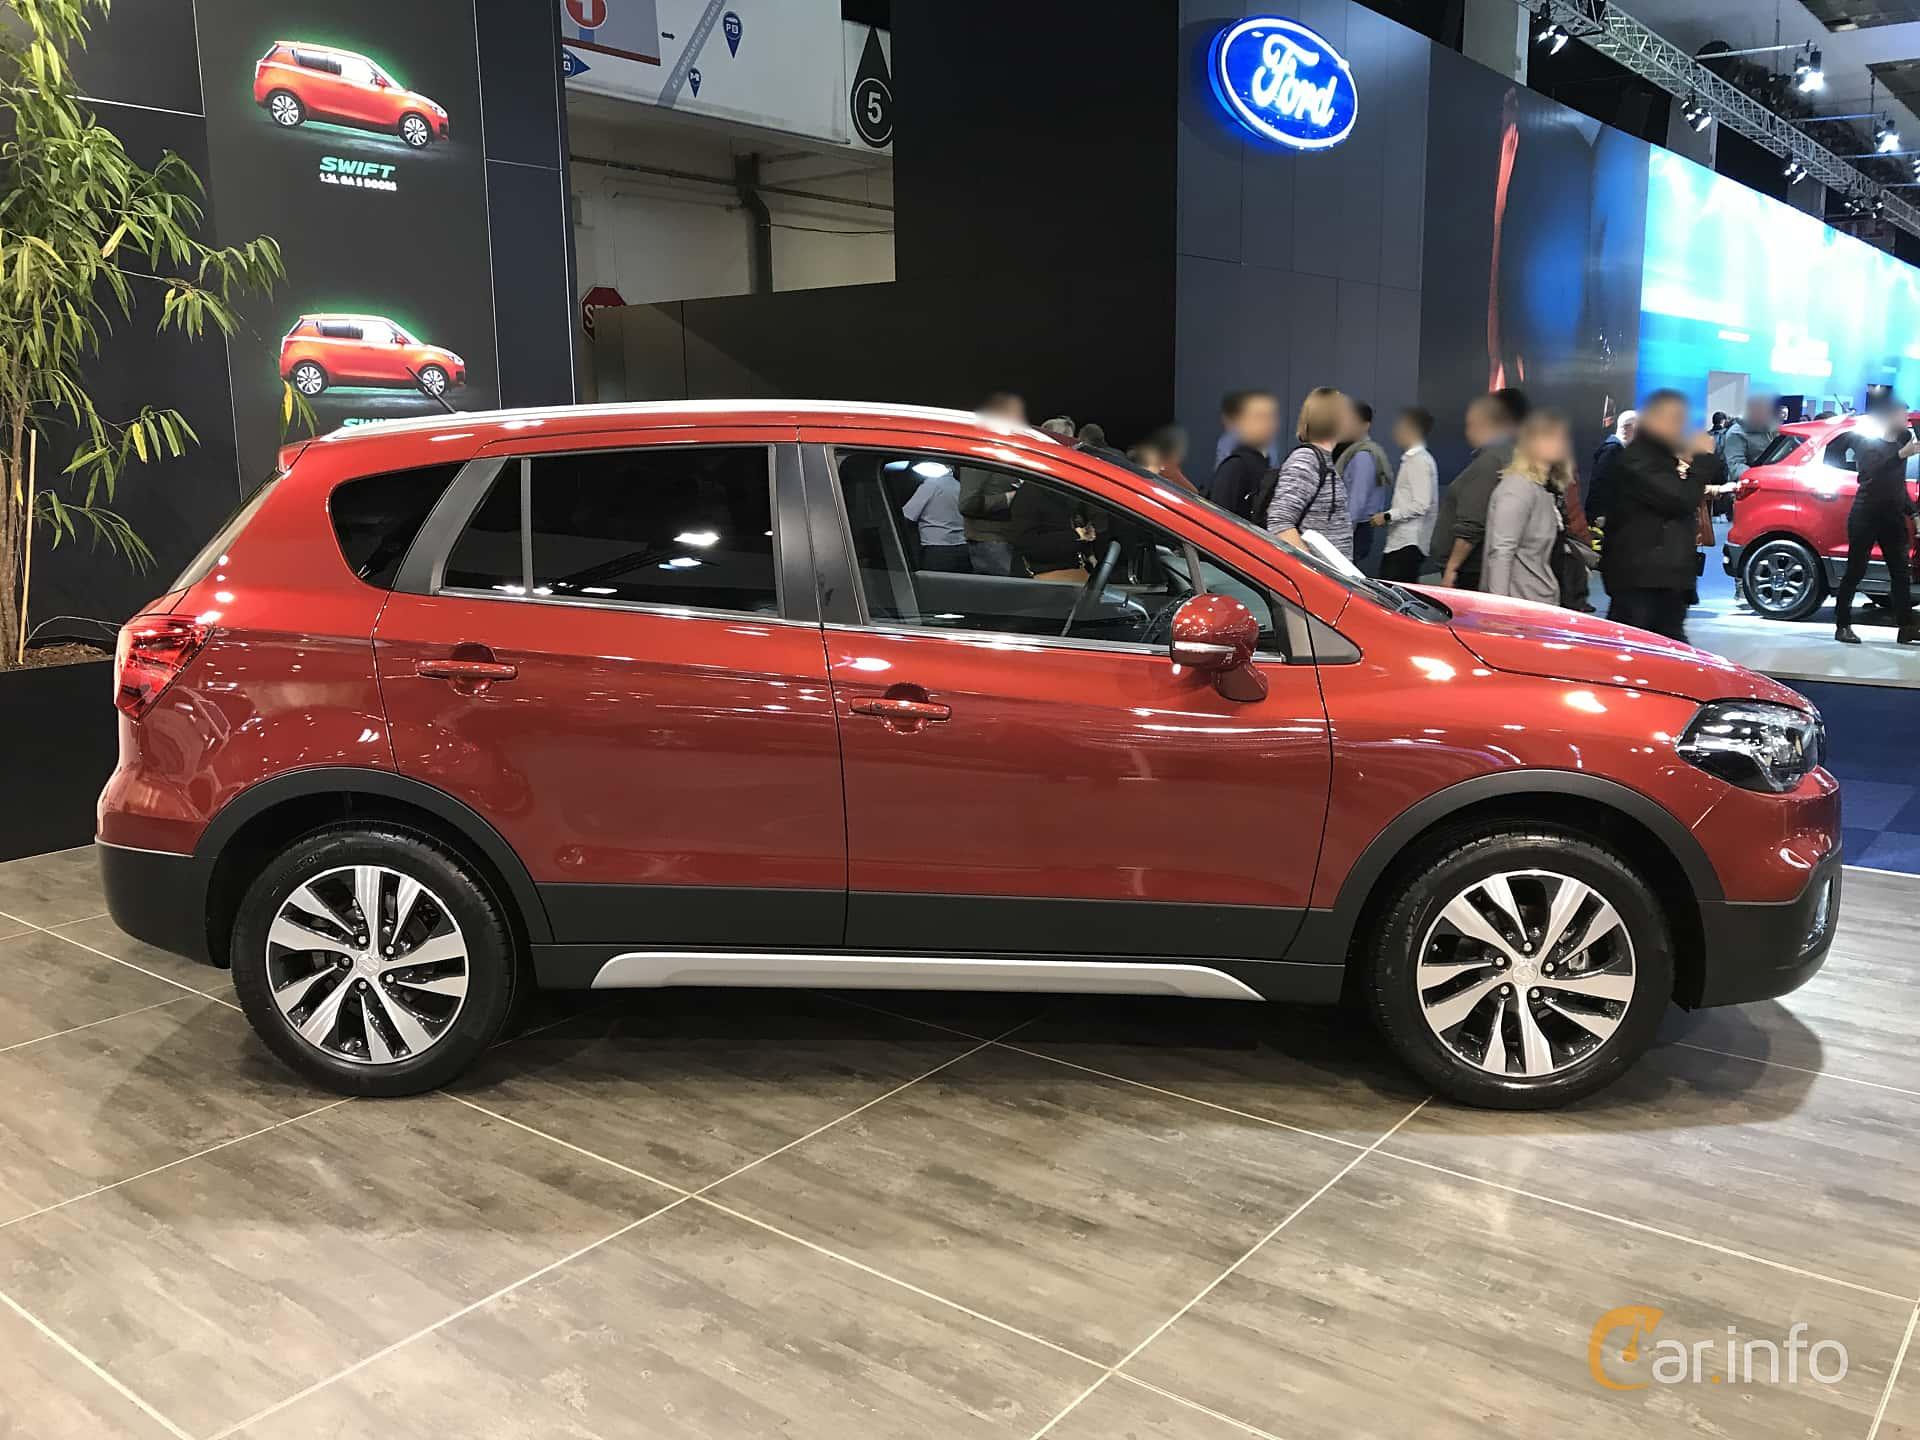 2020 Suzuki Sx4 Research New